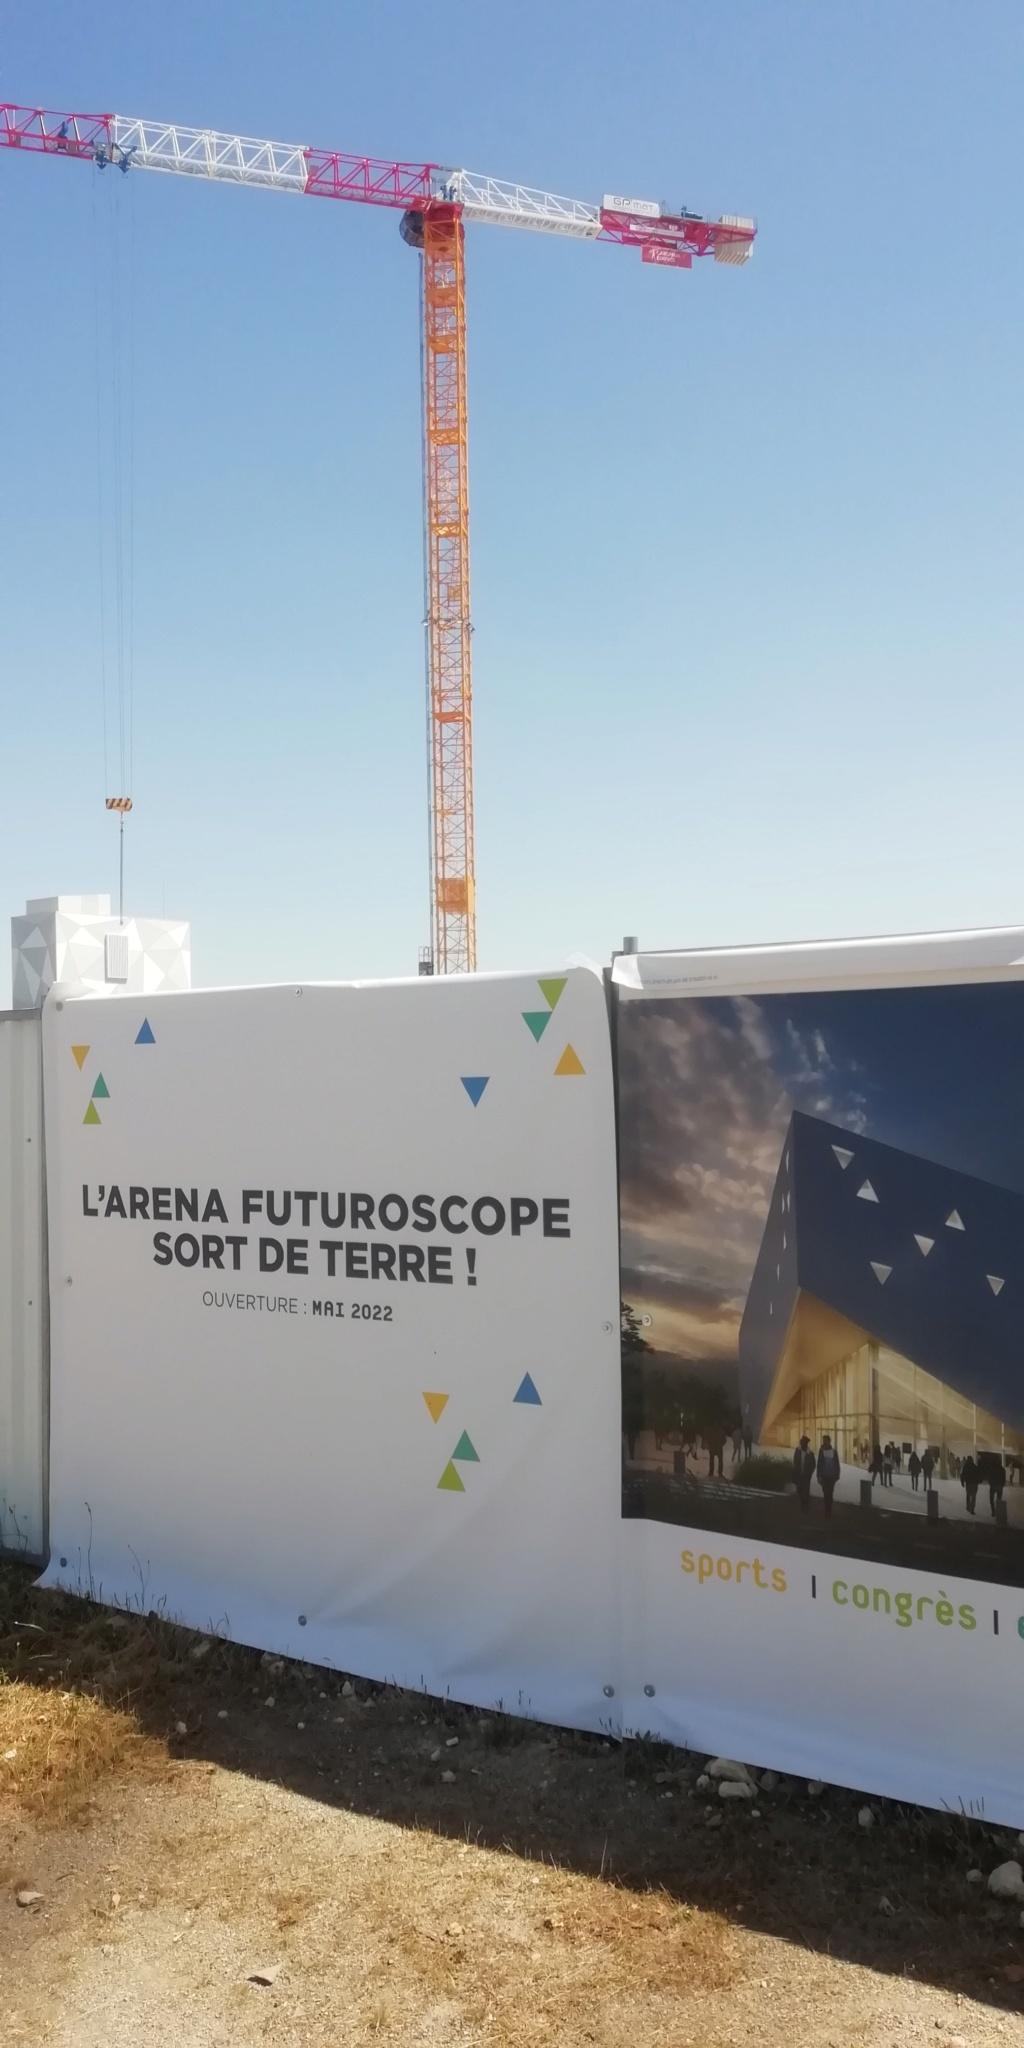 « Arena Futuroscope » grande salle de spectacles et de sports · 2022 - Page 11 Img_2019